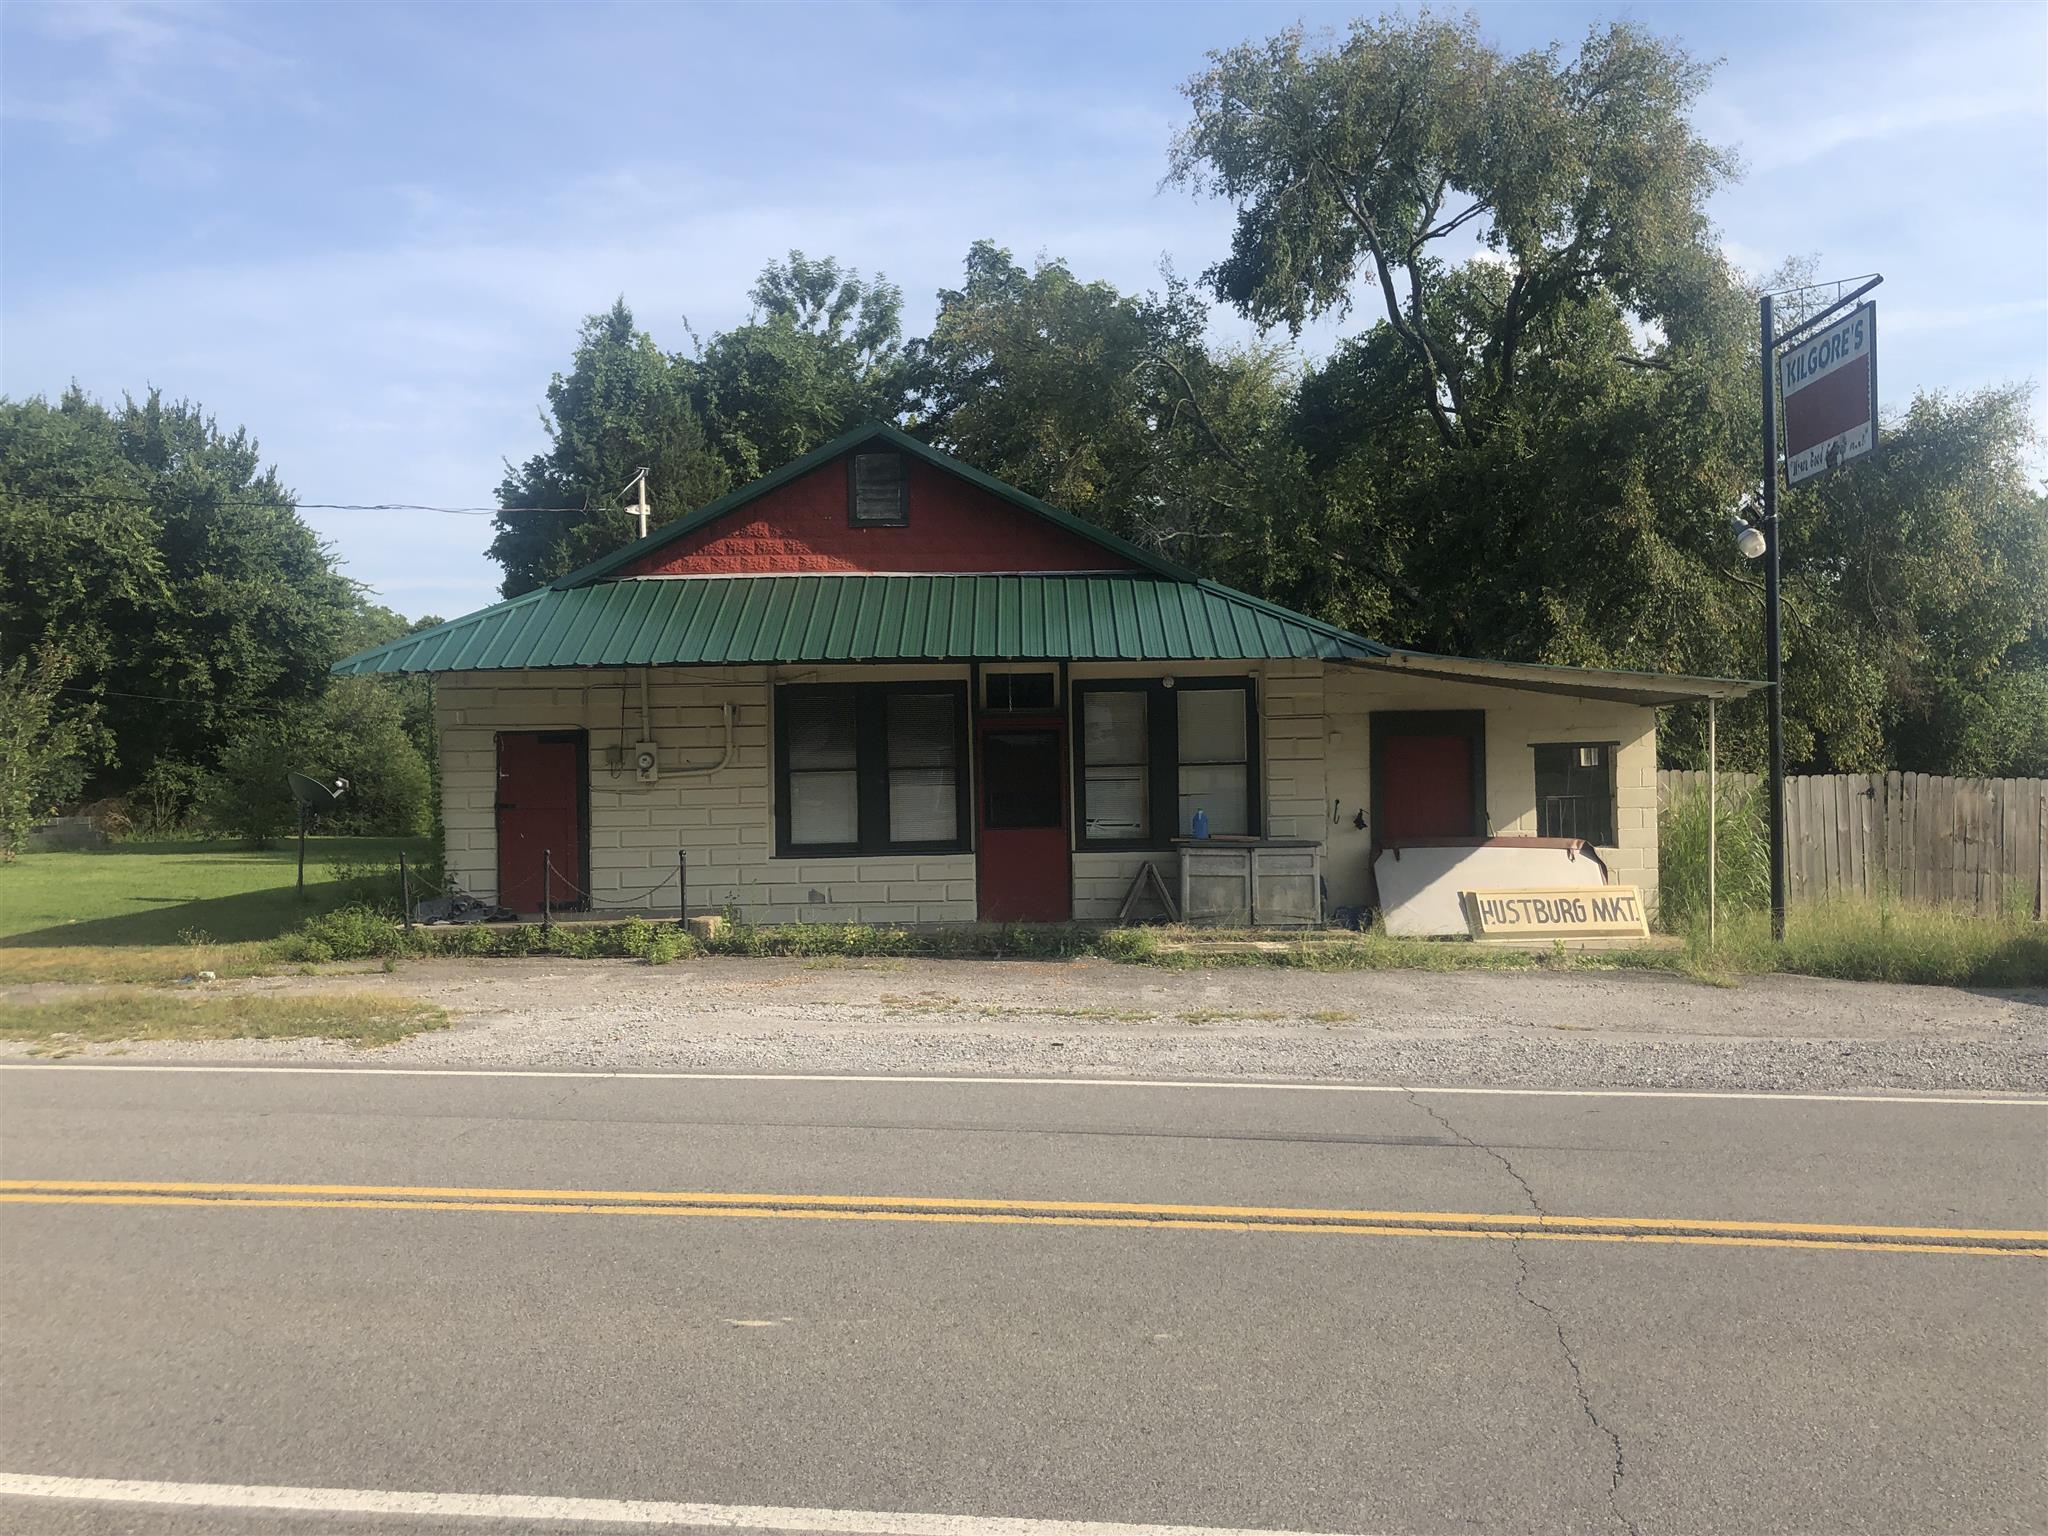 8679 Old State Route 1, New Johnsonville, TN 37134 - New Johnsonville, TN real estate listing